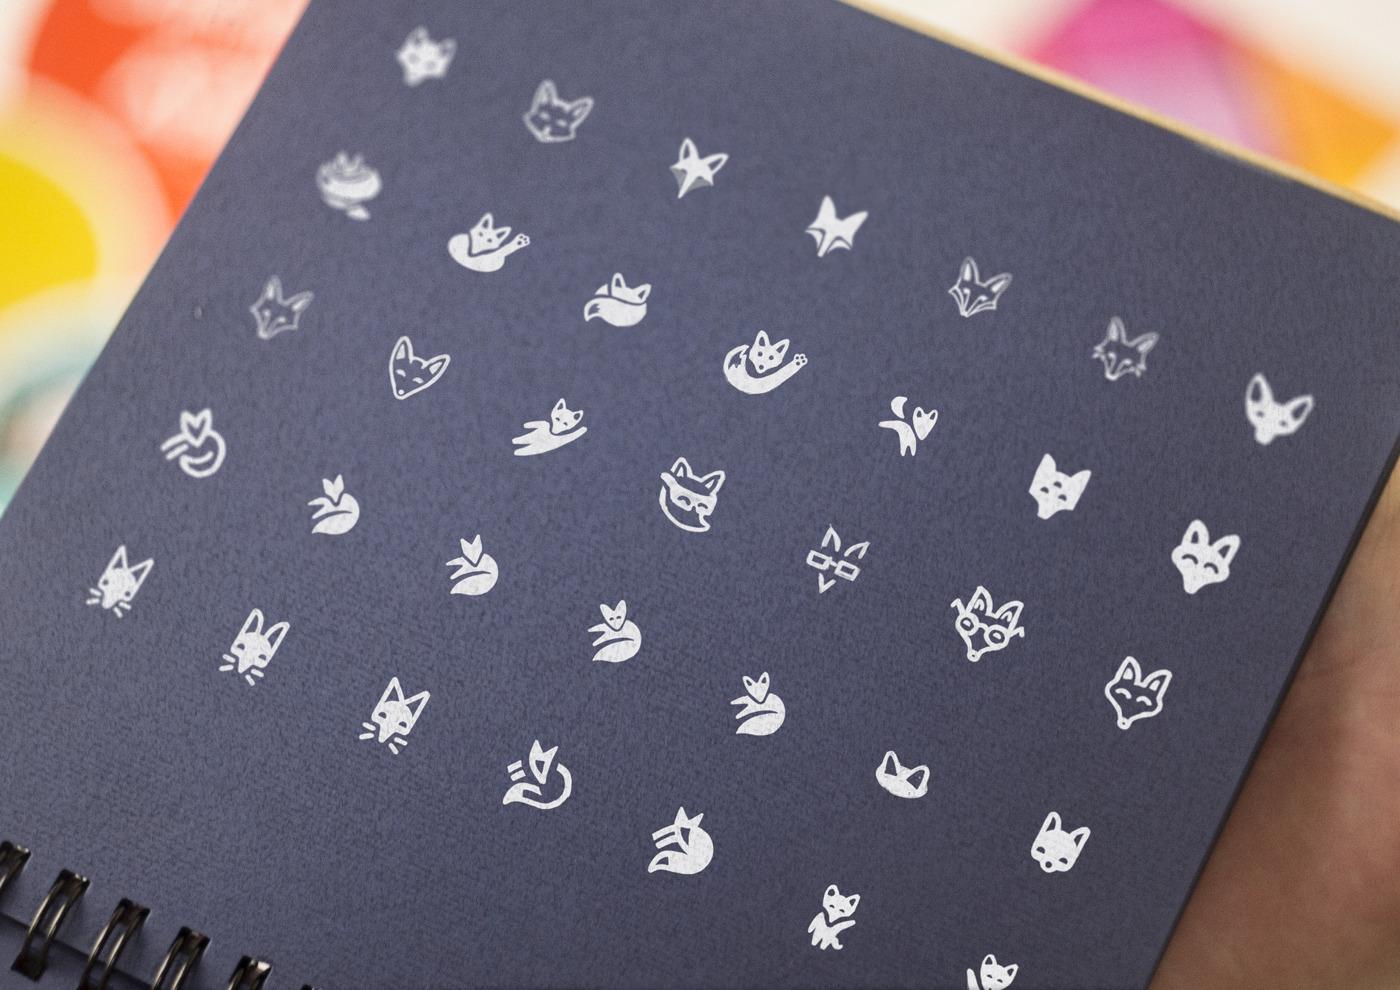 kitsu pictograms